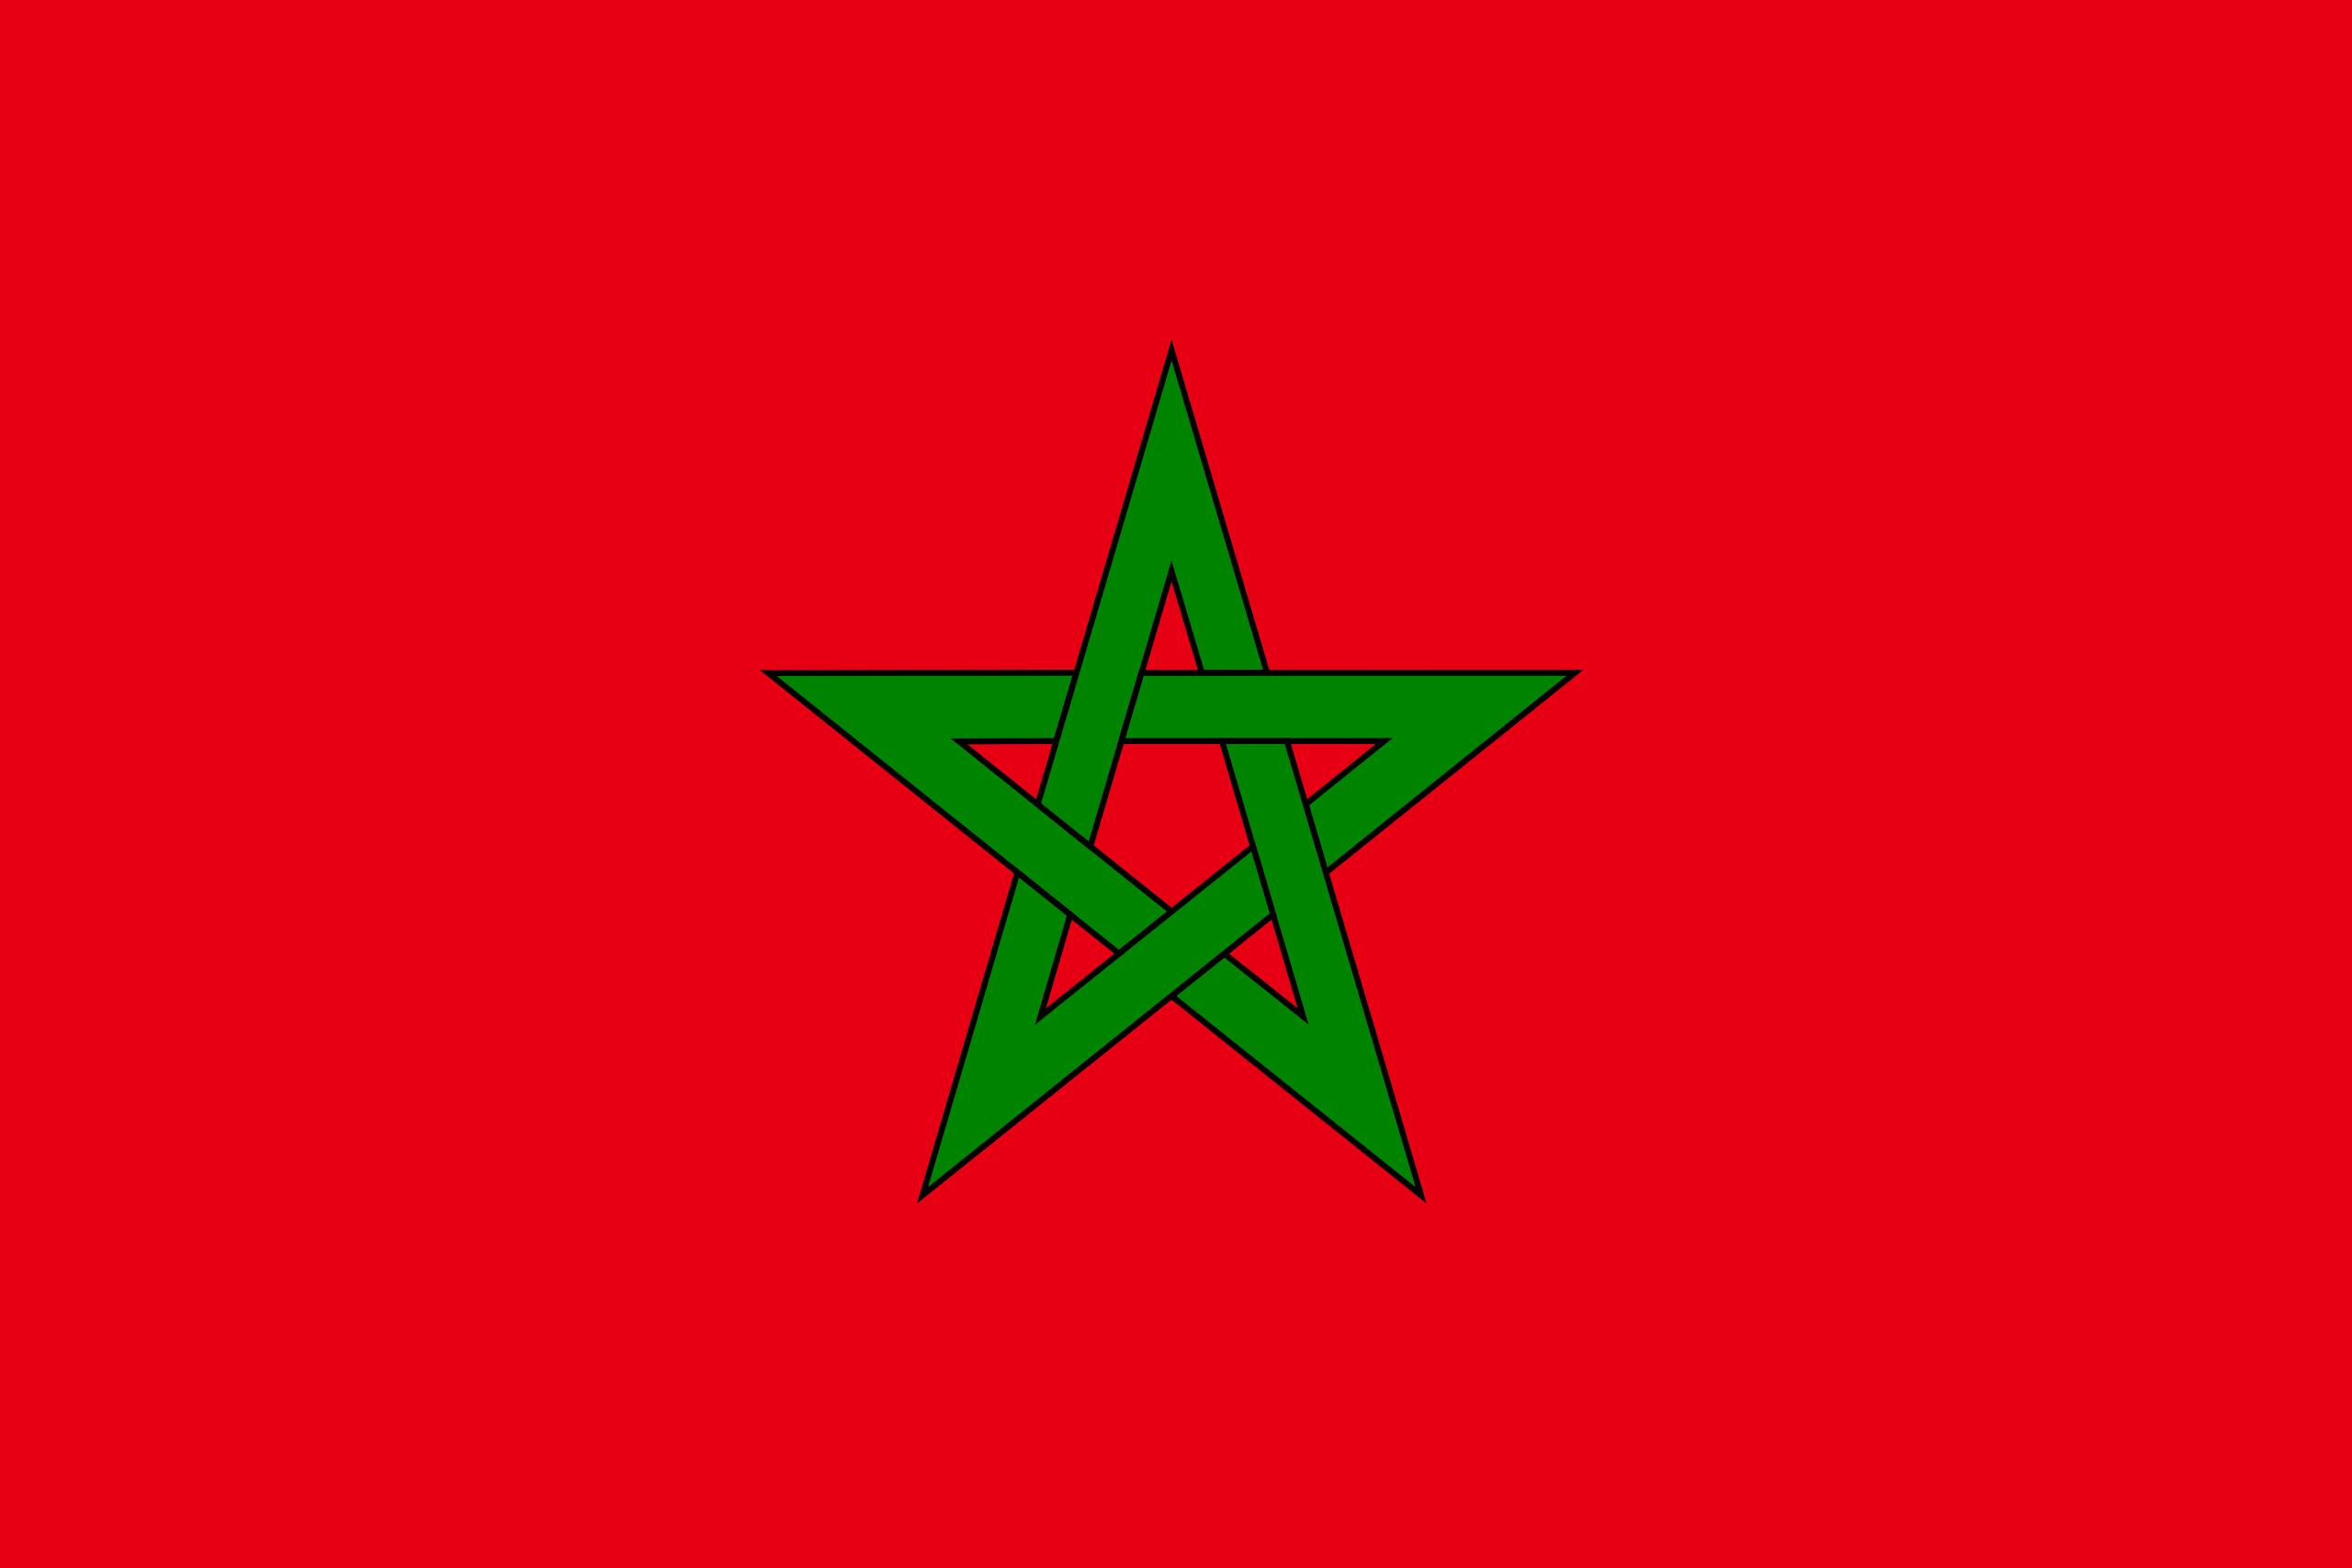 marruecos, país, emblema, insignia, символ - Обои HD - Профессор falken.com